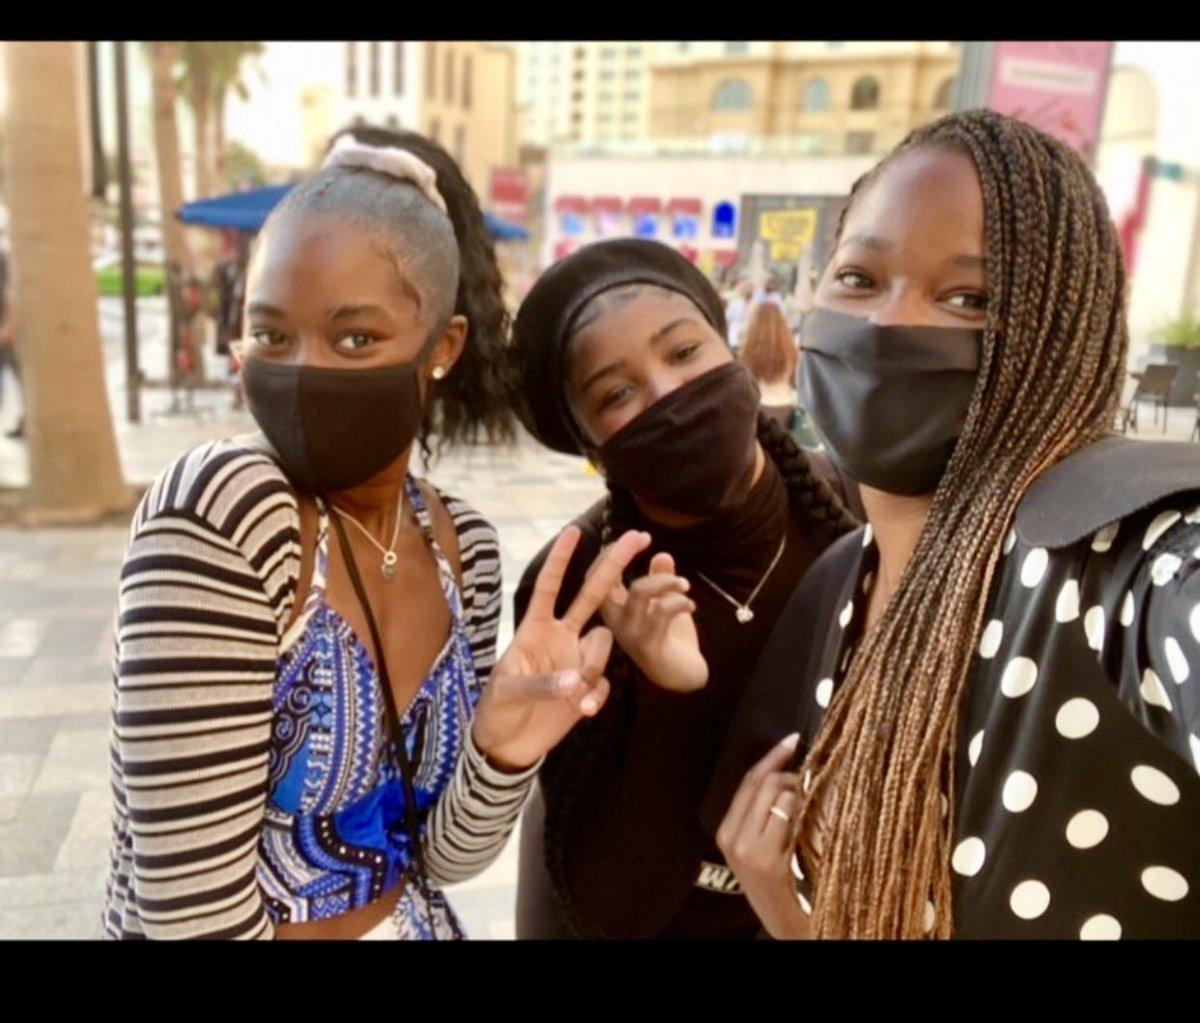 Be sure to stay safe & mask-up like @Jamelia & her two daughters 💯 #maskup #facemask #blackfacemasks #melanin #melanated #brownskin #naturalhair #boxbraids #motherdaughter #motherhood #sisters #sisterhood #brummie #britishgirls